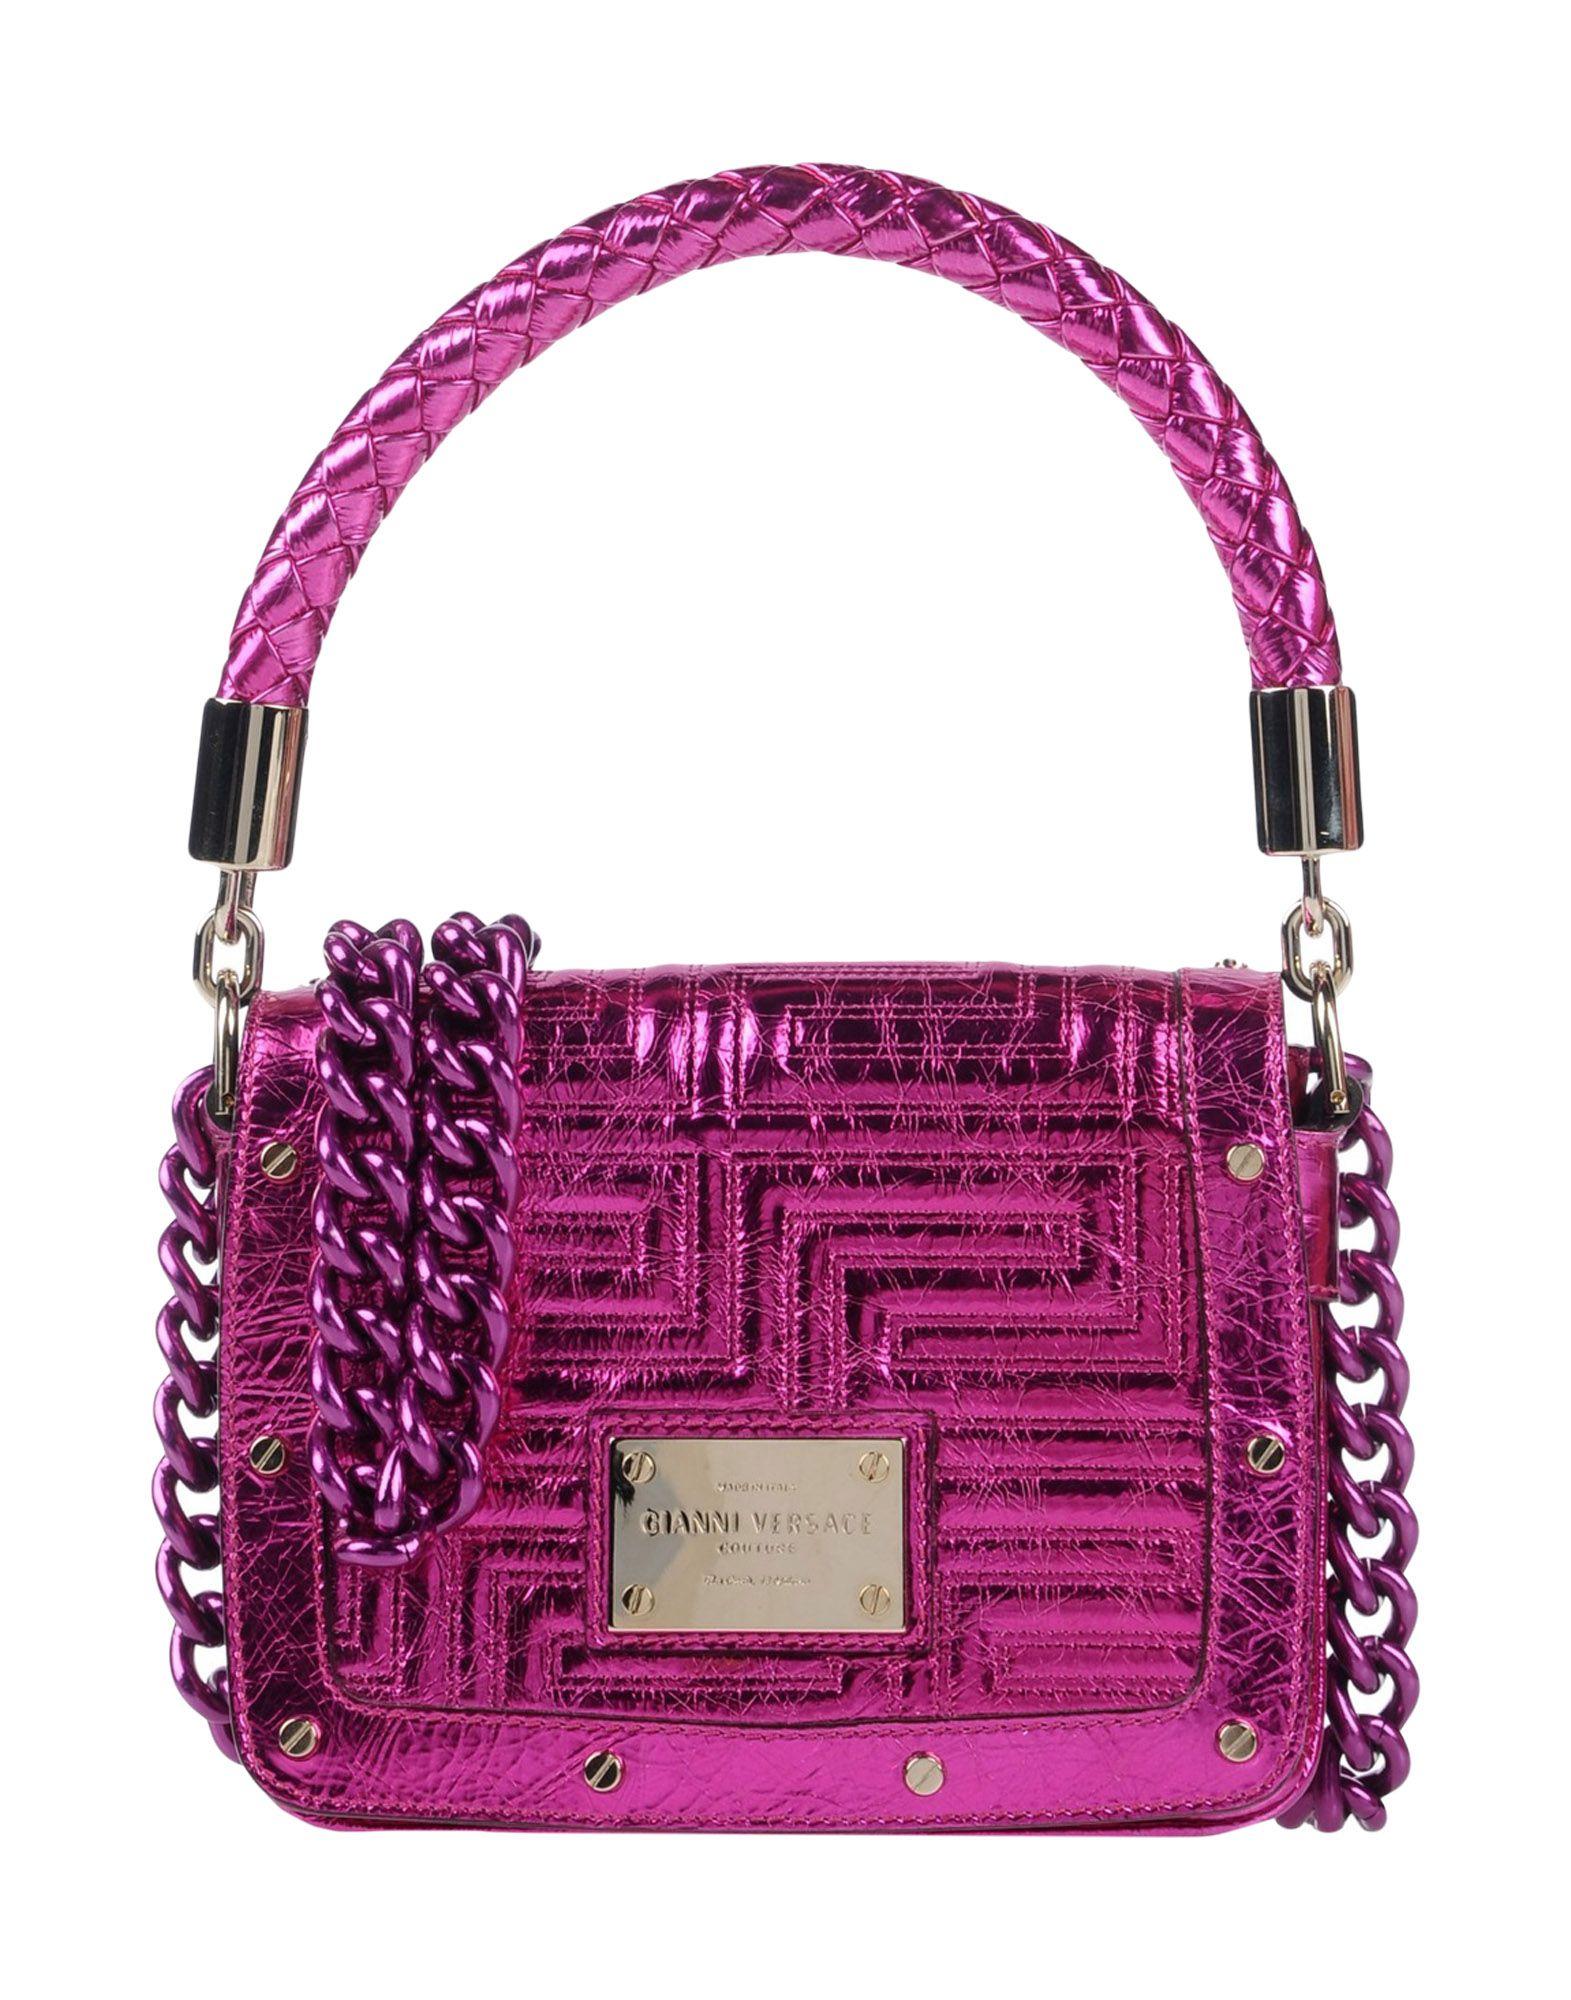 GIANNI VERSACE Handbag in Fuchsia